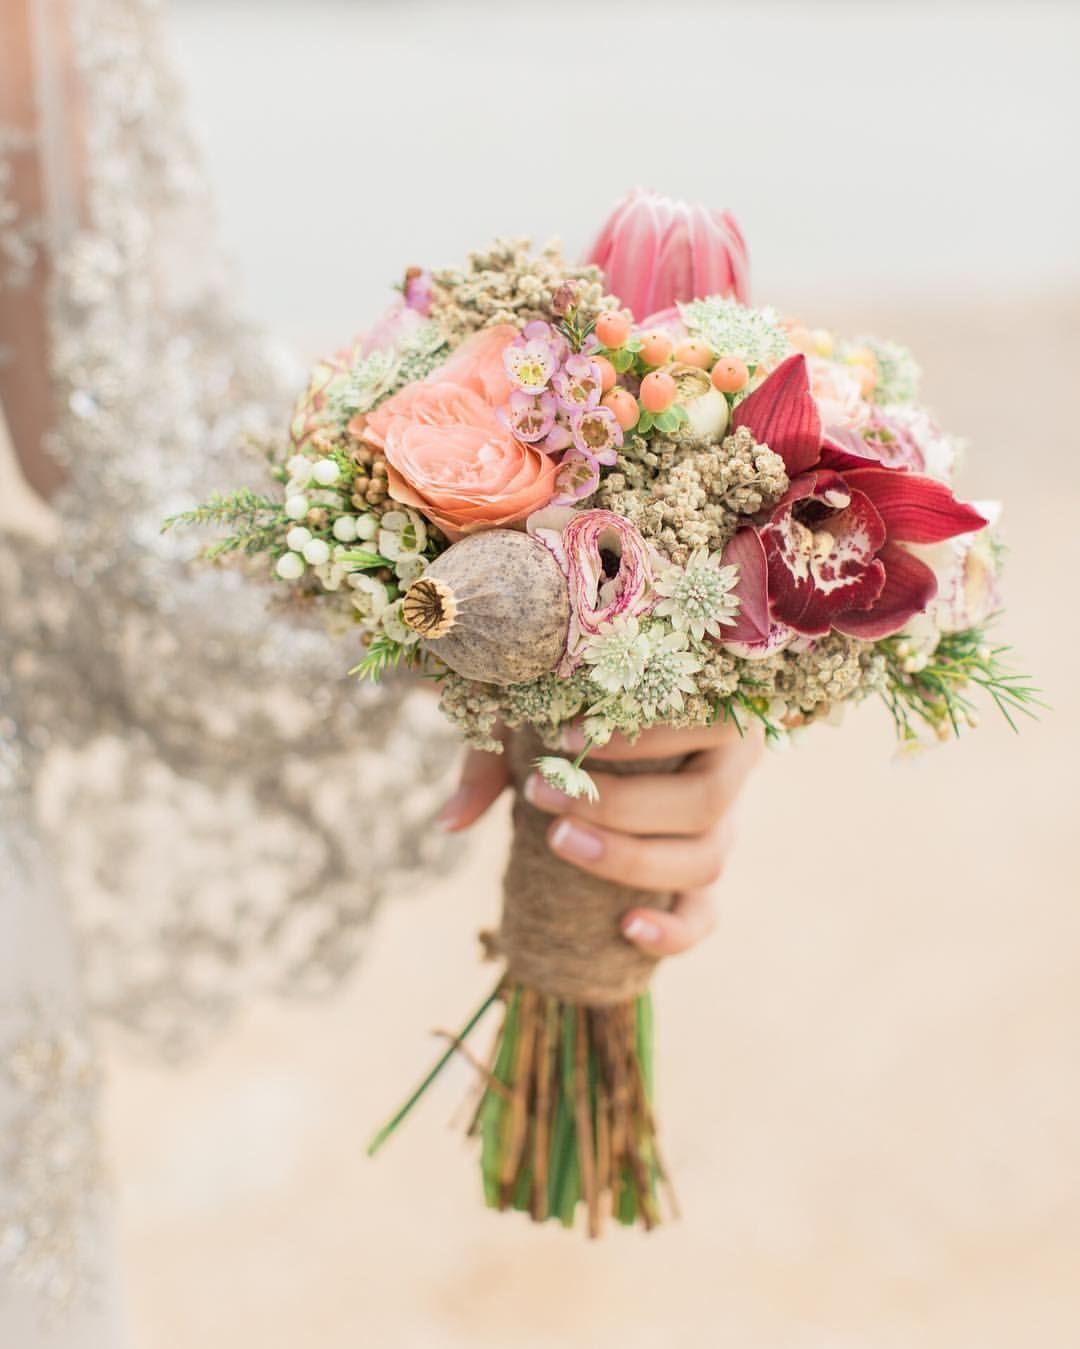 "Instagram'da Weddings | Events : ""En güzel detaylardan  #details #lutfiyemahmut #engagement Buket  @yunuskarma ——— #gelinbuketi #floraldesign #dugunfotografcisi #weddingphotography #fineartwedding #yunuskarma"""